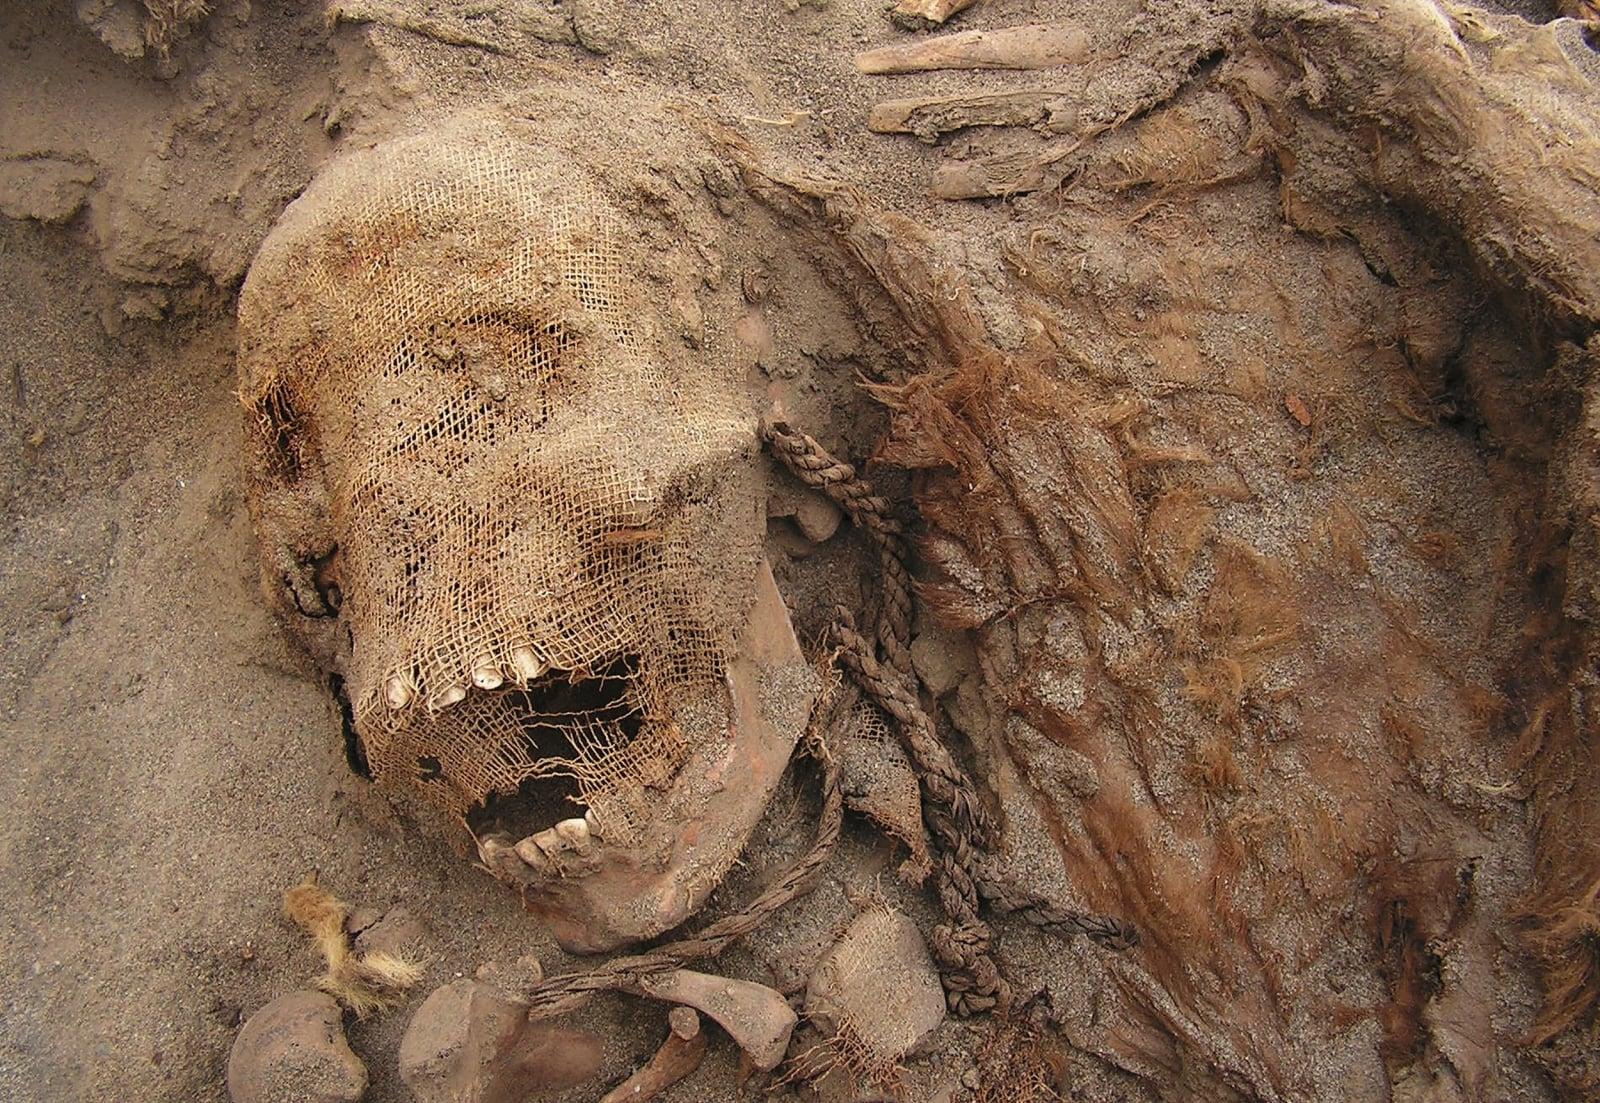 Wykopaliska w Peru fot. EPA/NATIONAL GEOGRAPHIC